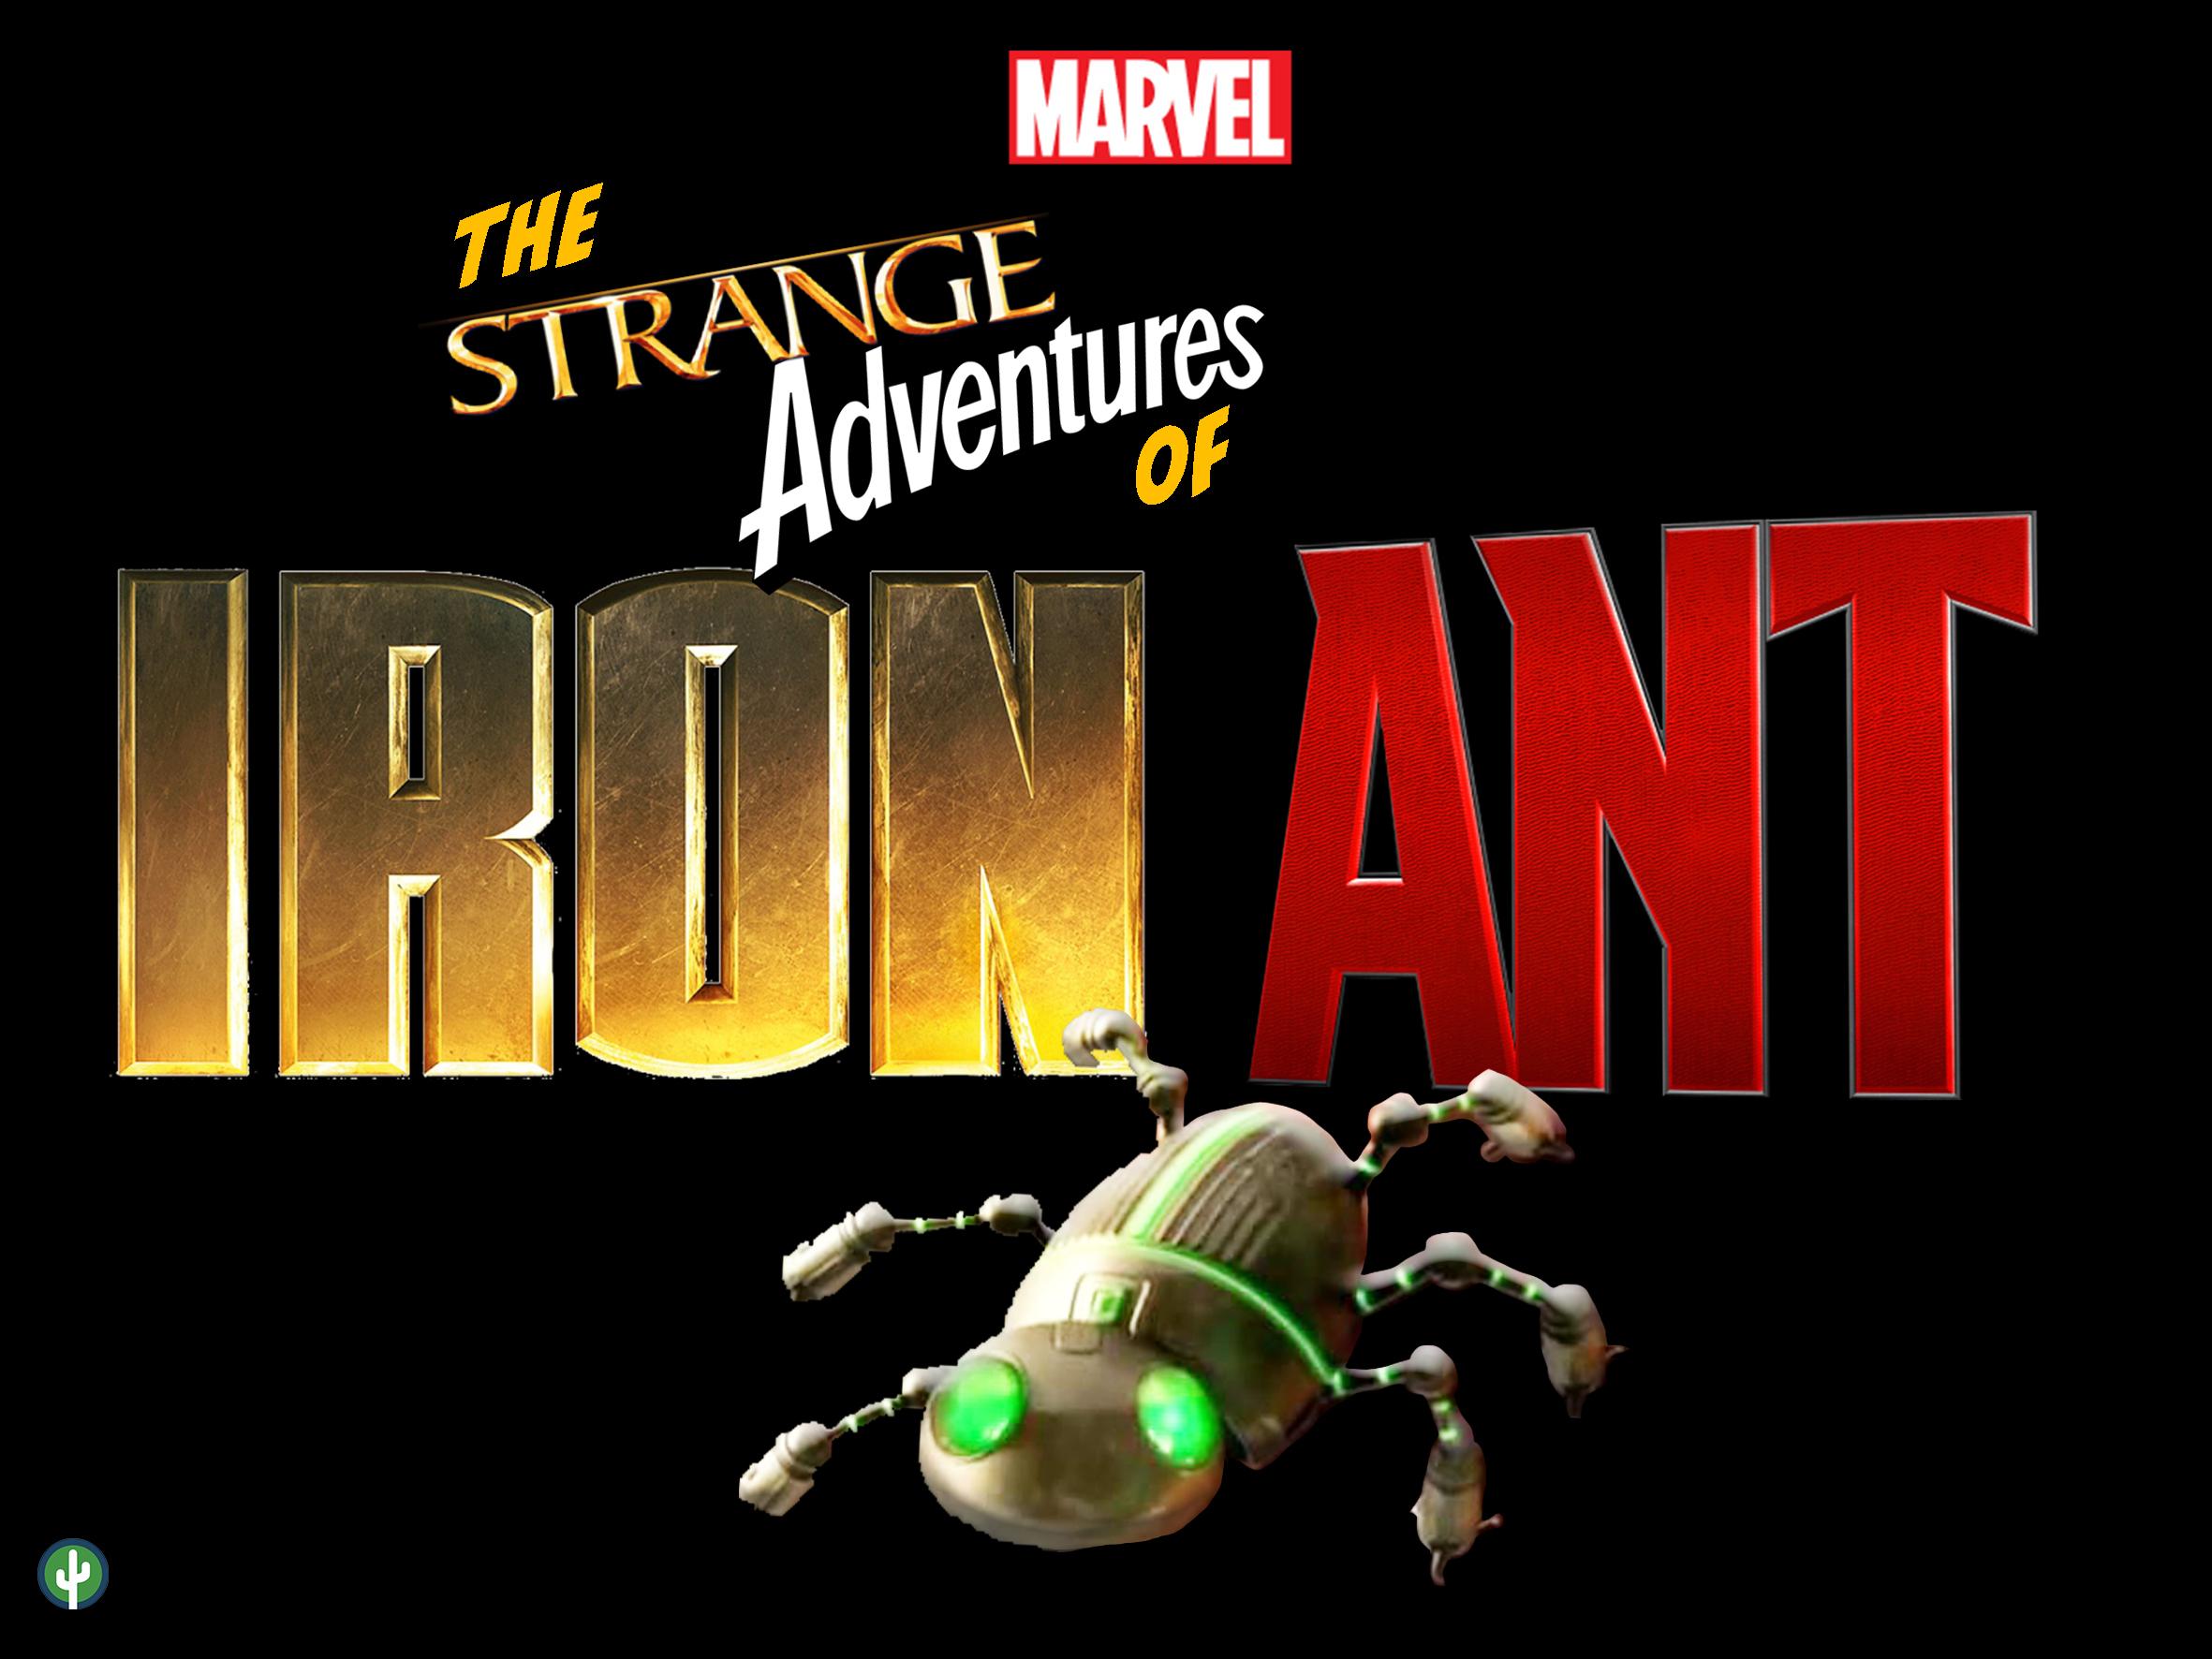 Marvel Iron Man Doctor Strange Antman Poster Meme